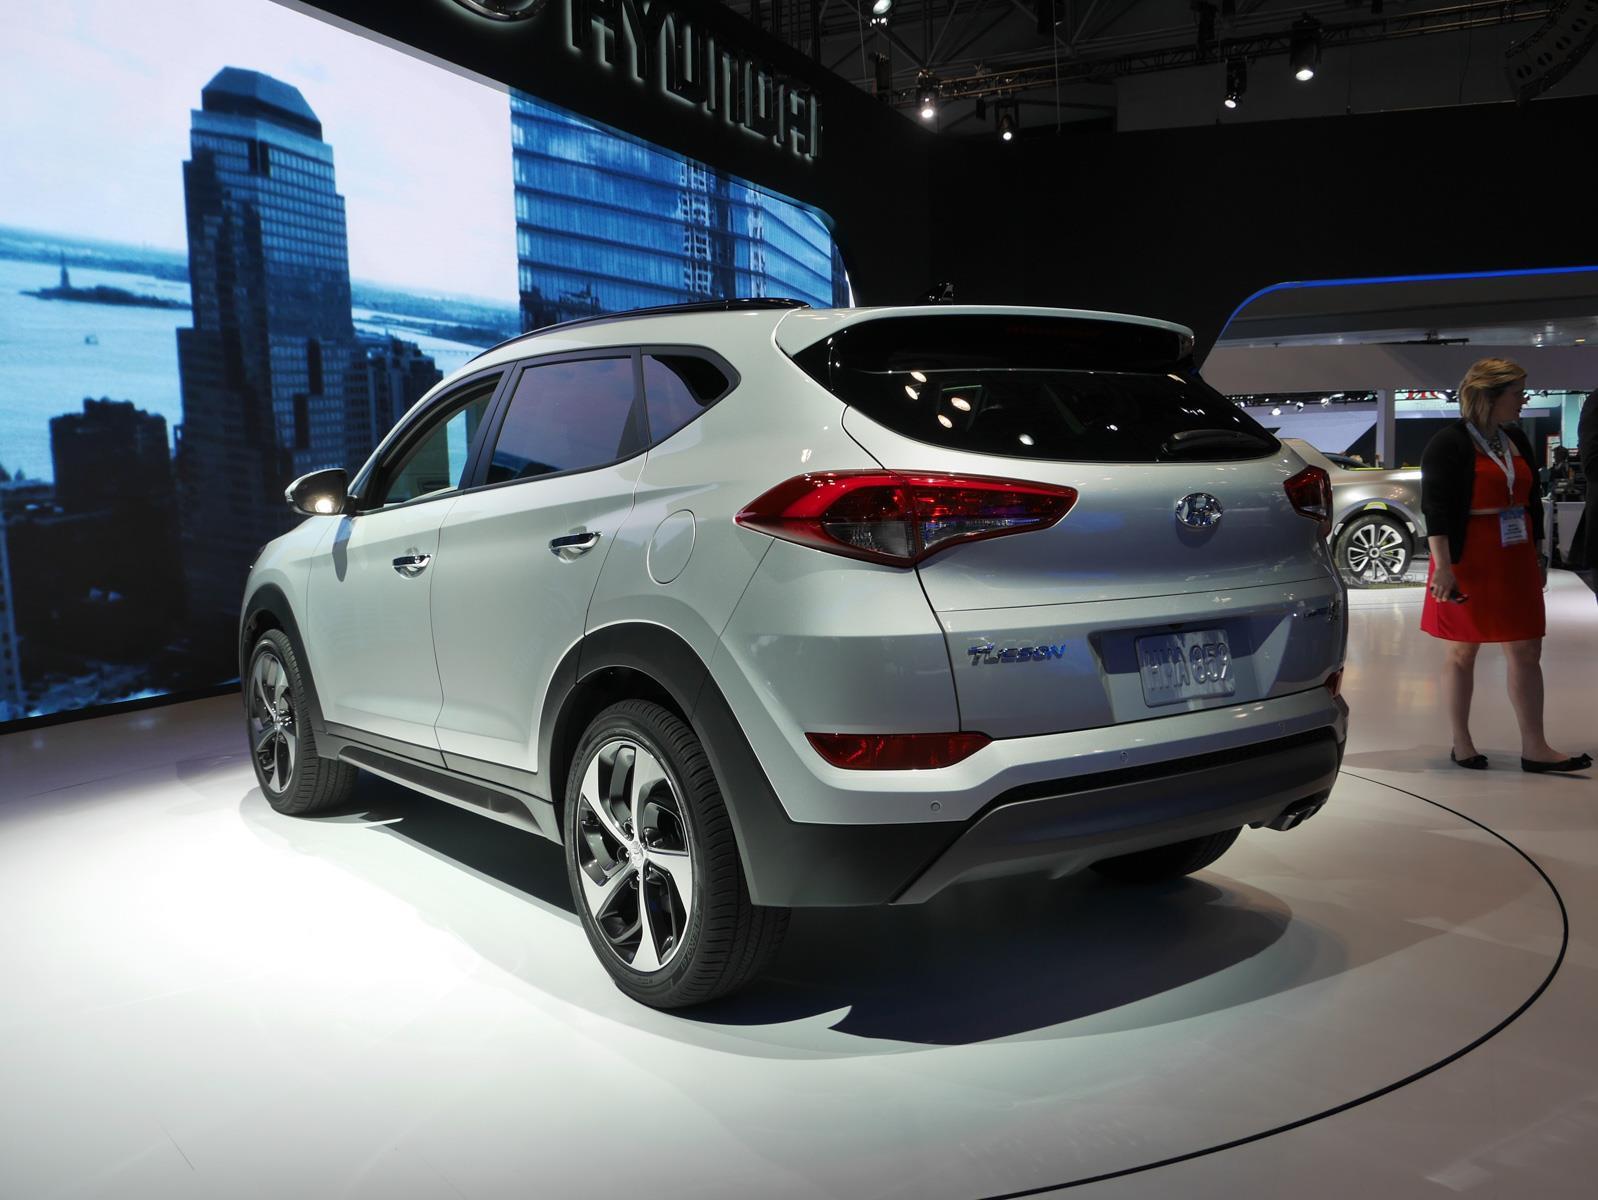 Auto Show De Nueva York 2015 Hyundai Tucson 2016 Ms